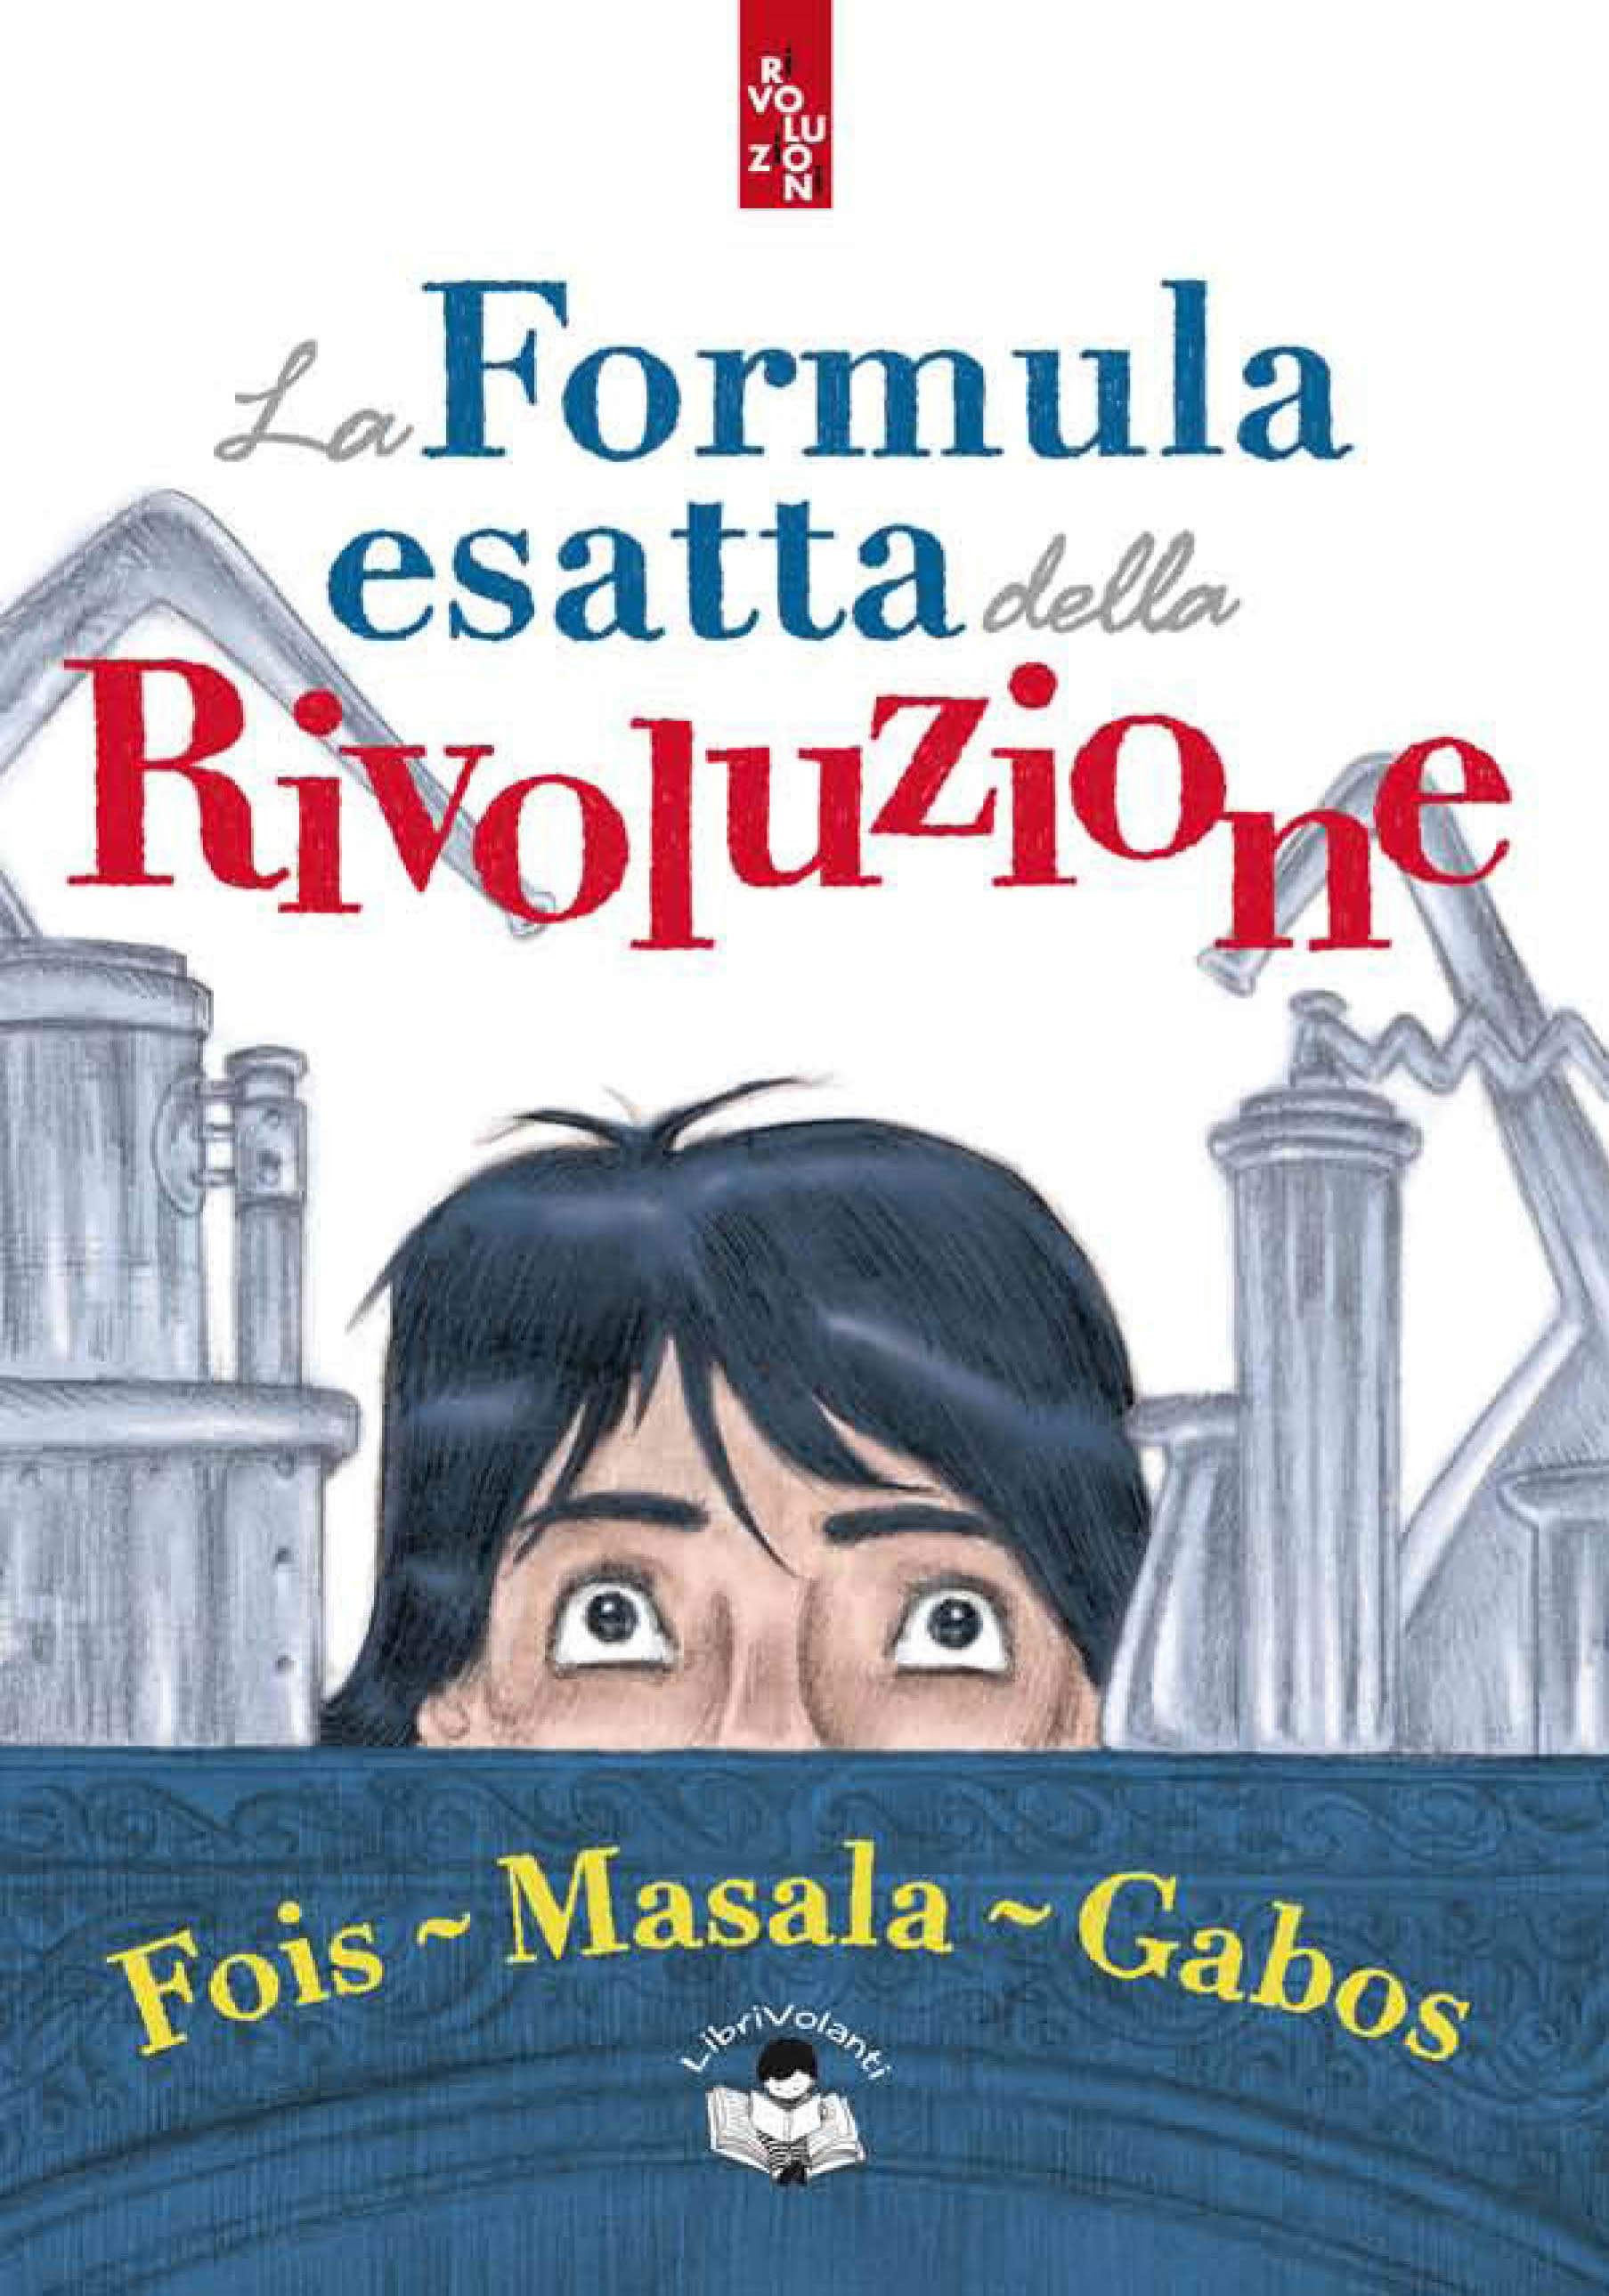 laformulaesatta_invito-_feat